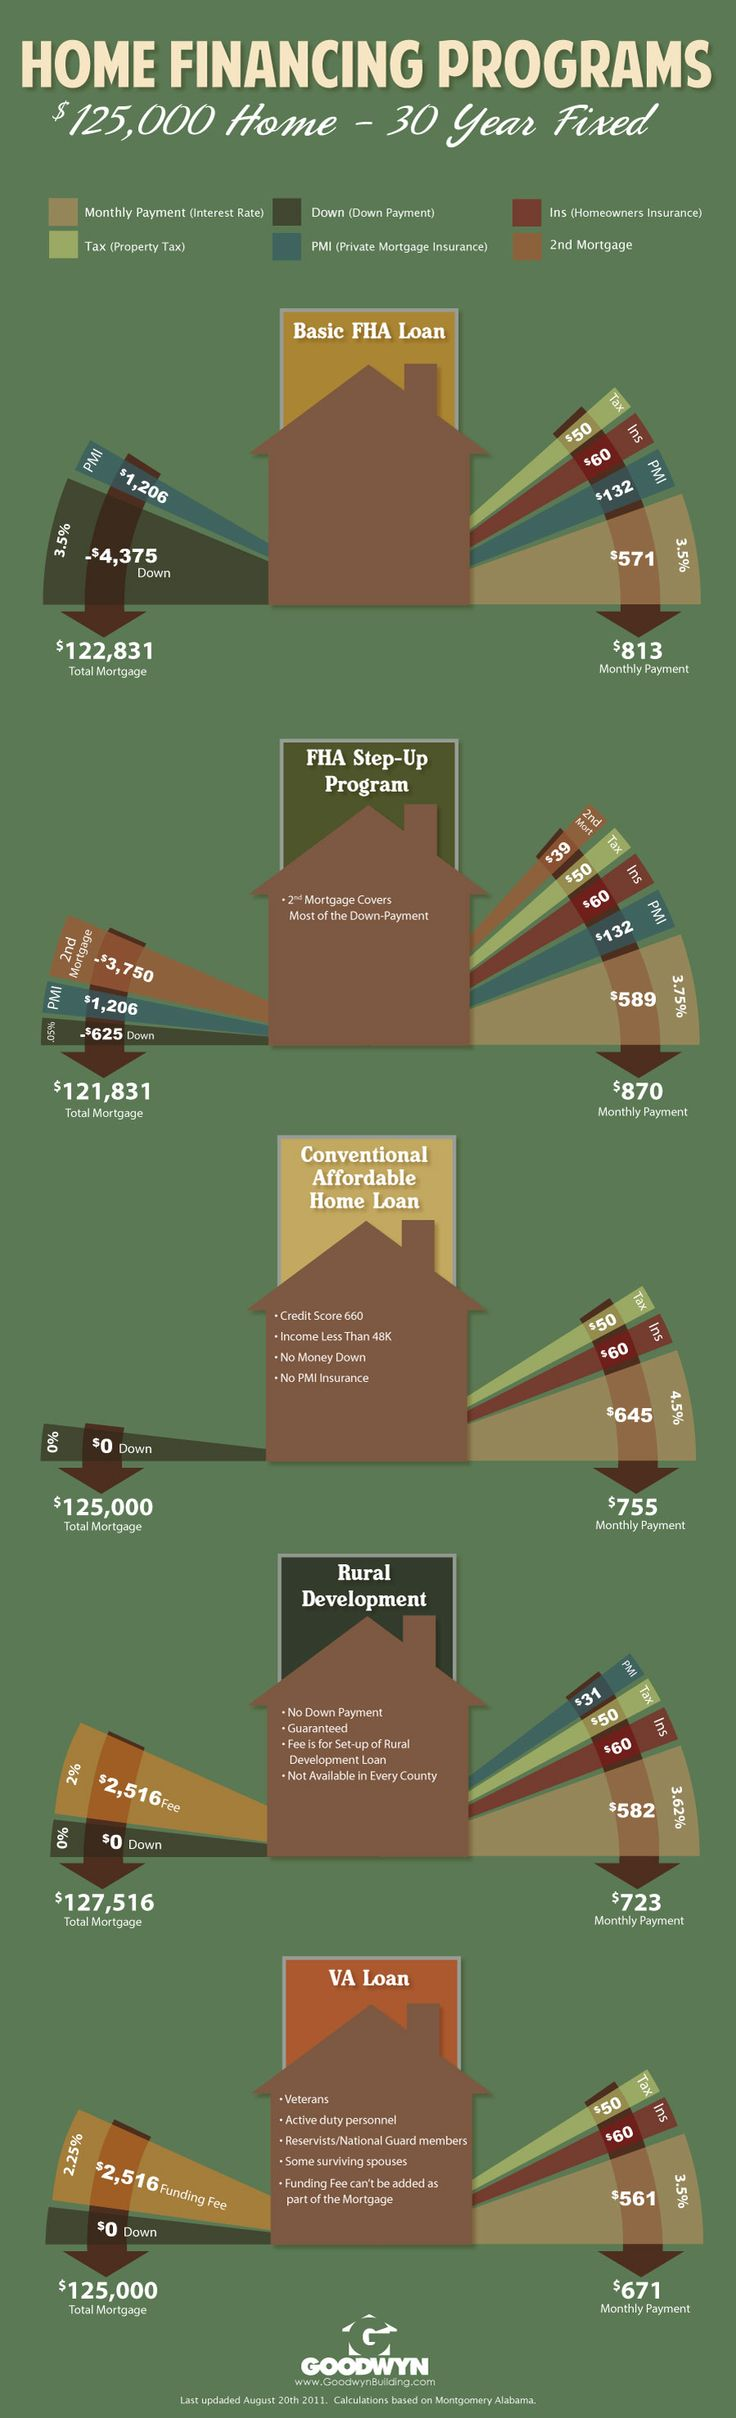 Home Financing Programs Infographic  #home #finance #mortgage